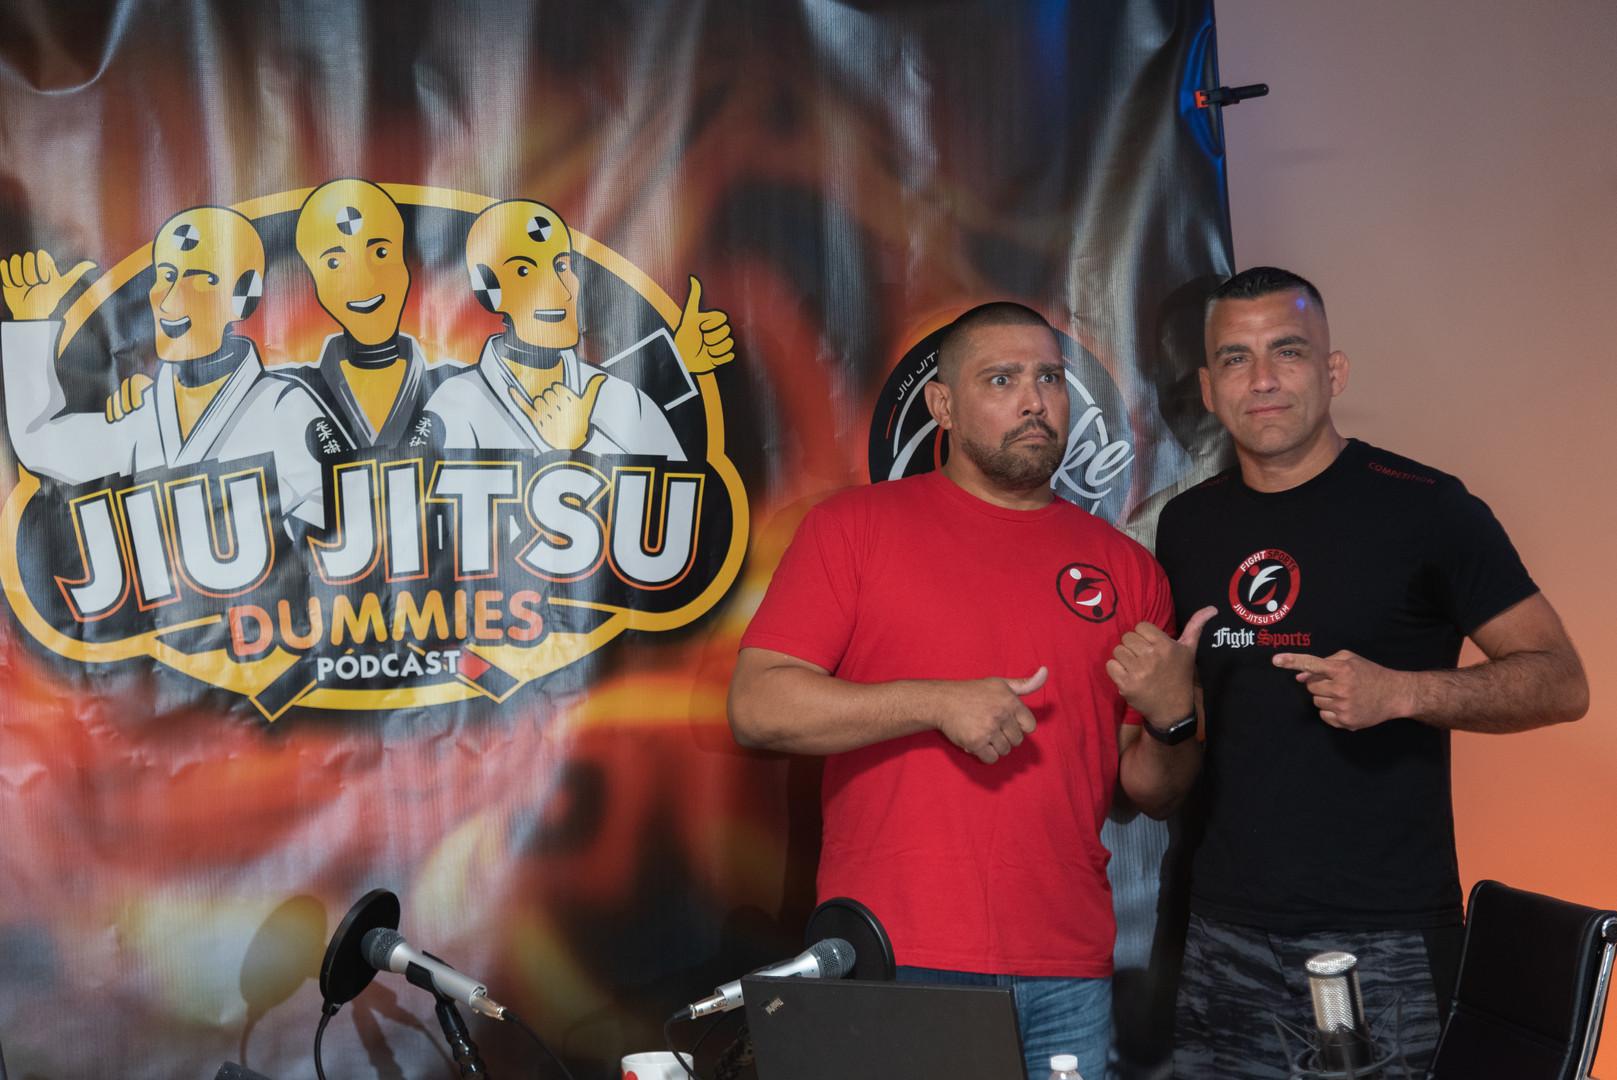 Jiu Jitsu Dummies Podcast